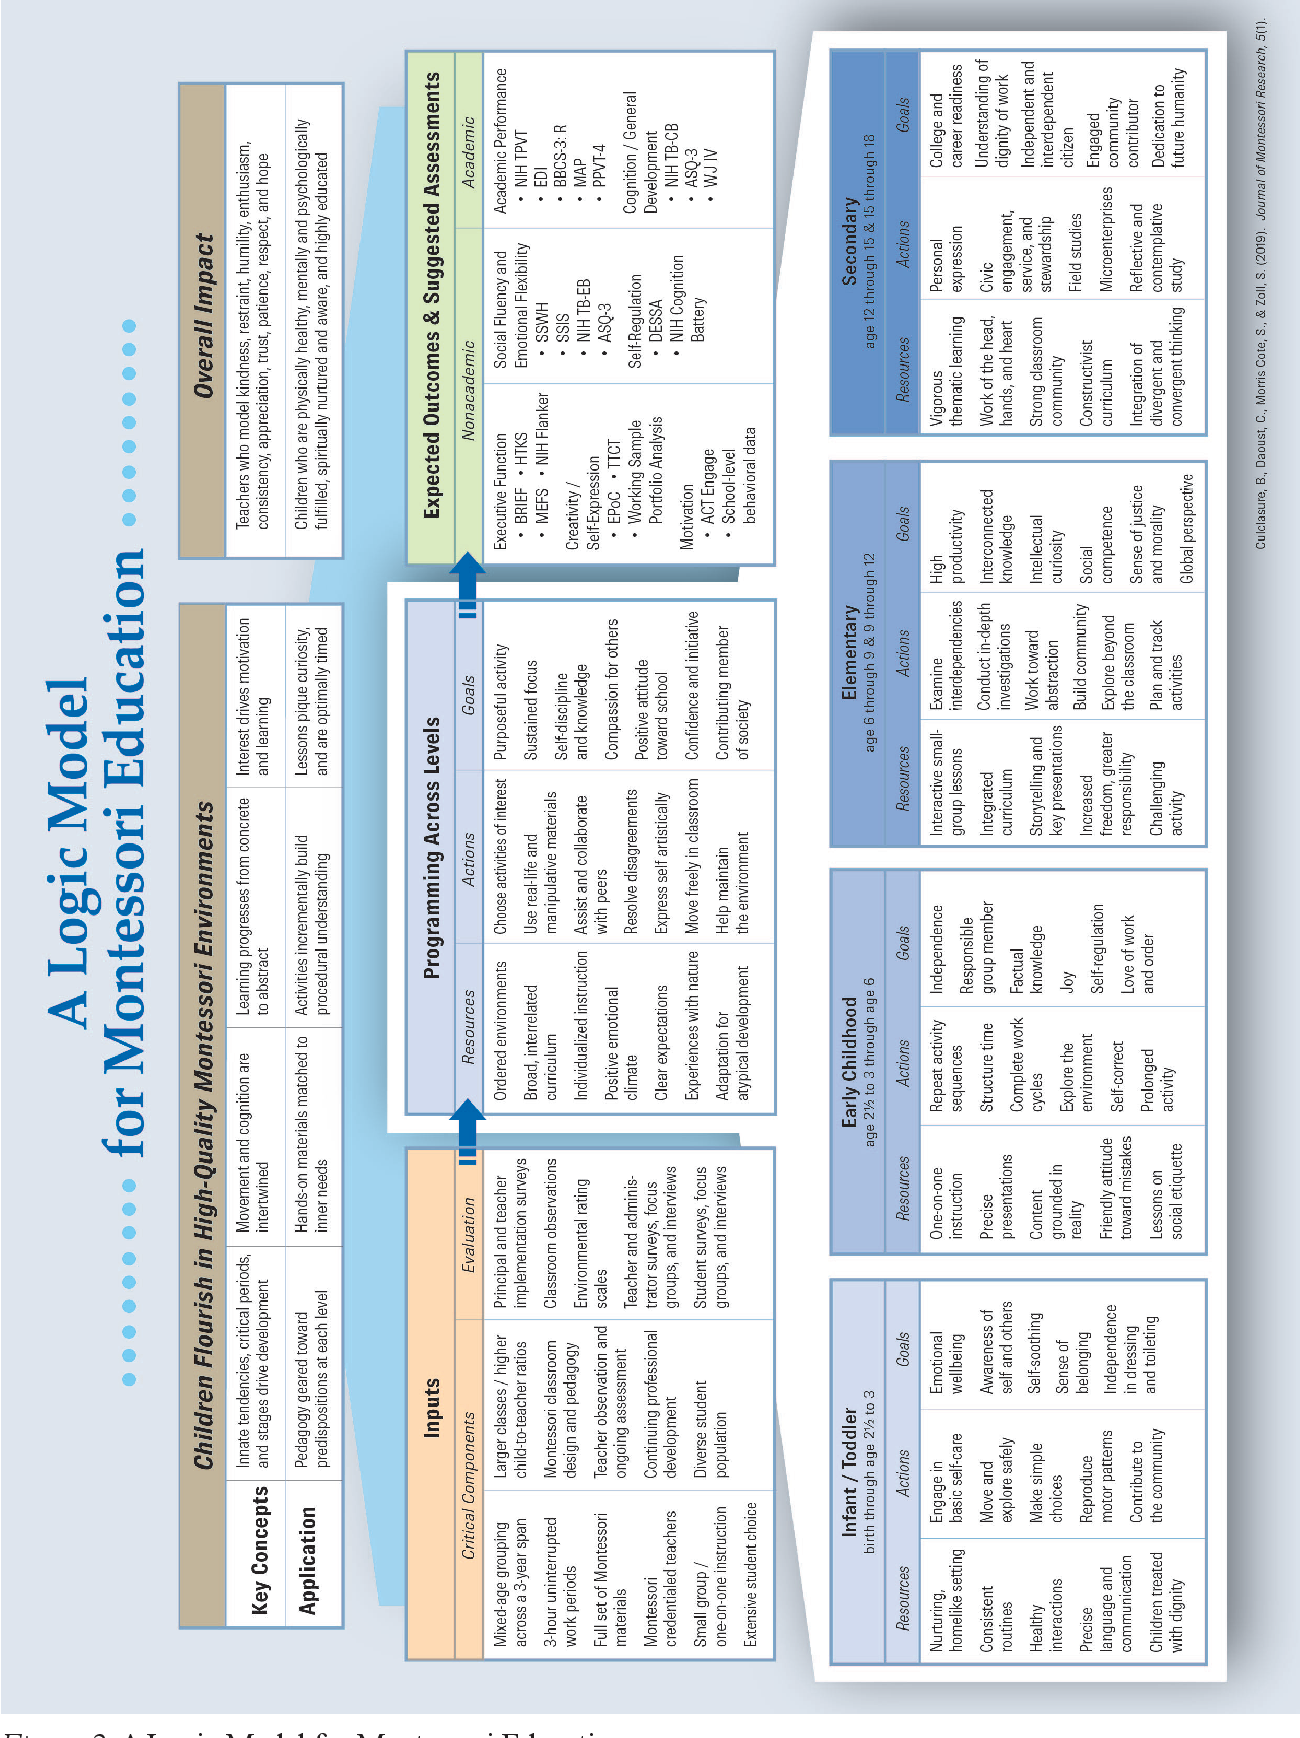 Pdf Designing A Logic Model To Inform Montessori Research Semantic Scholar